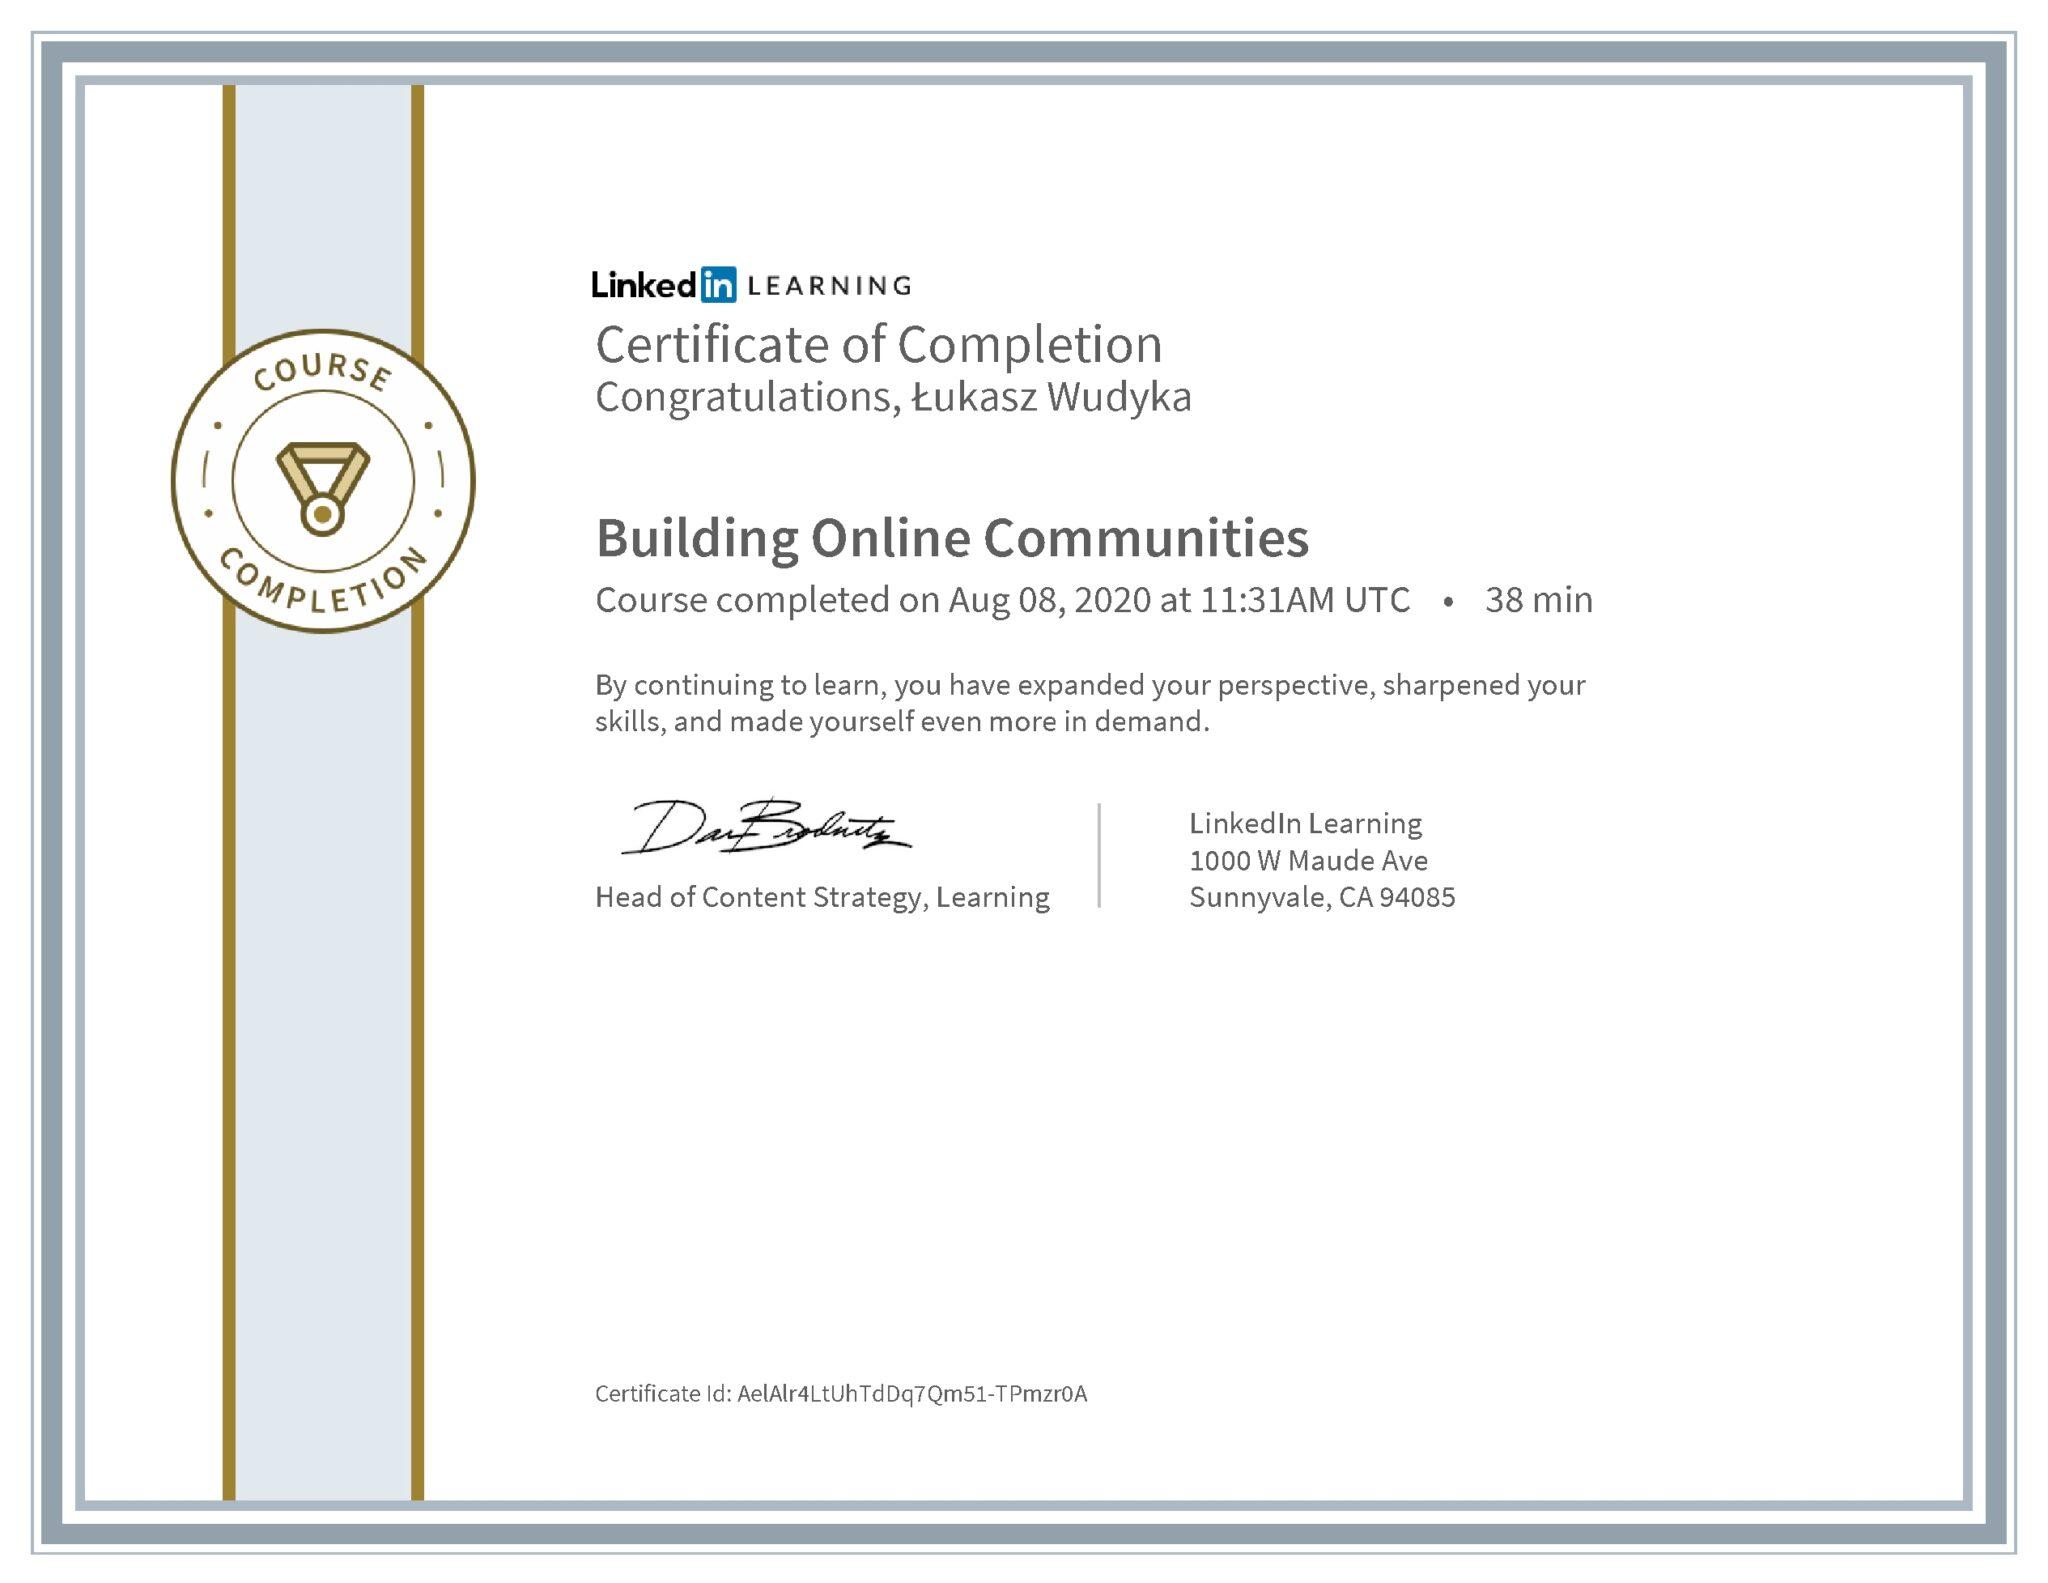 Łukasz Wudyka certyfikat LinkedIn Building Online Communities